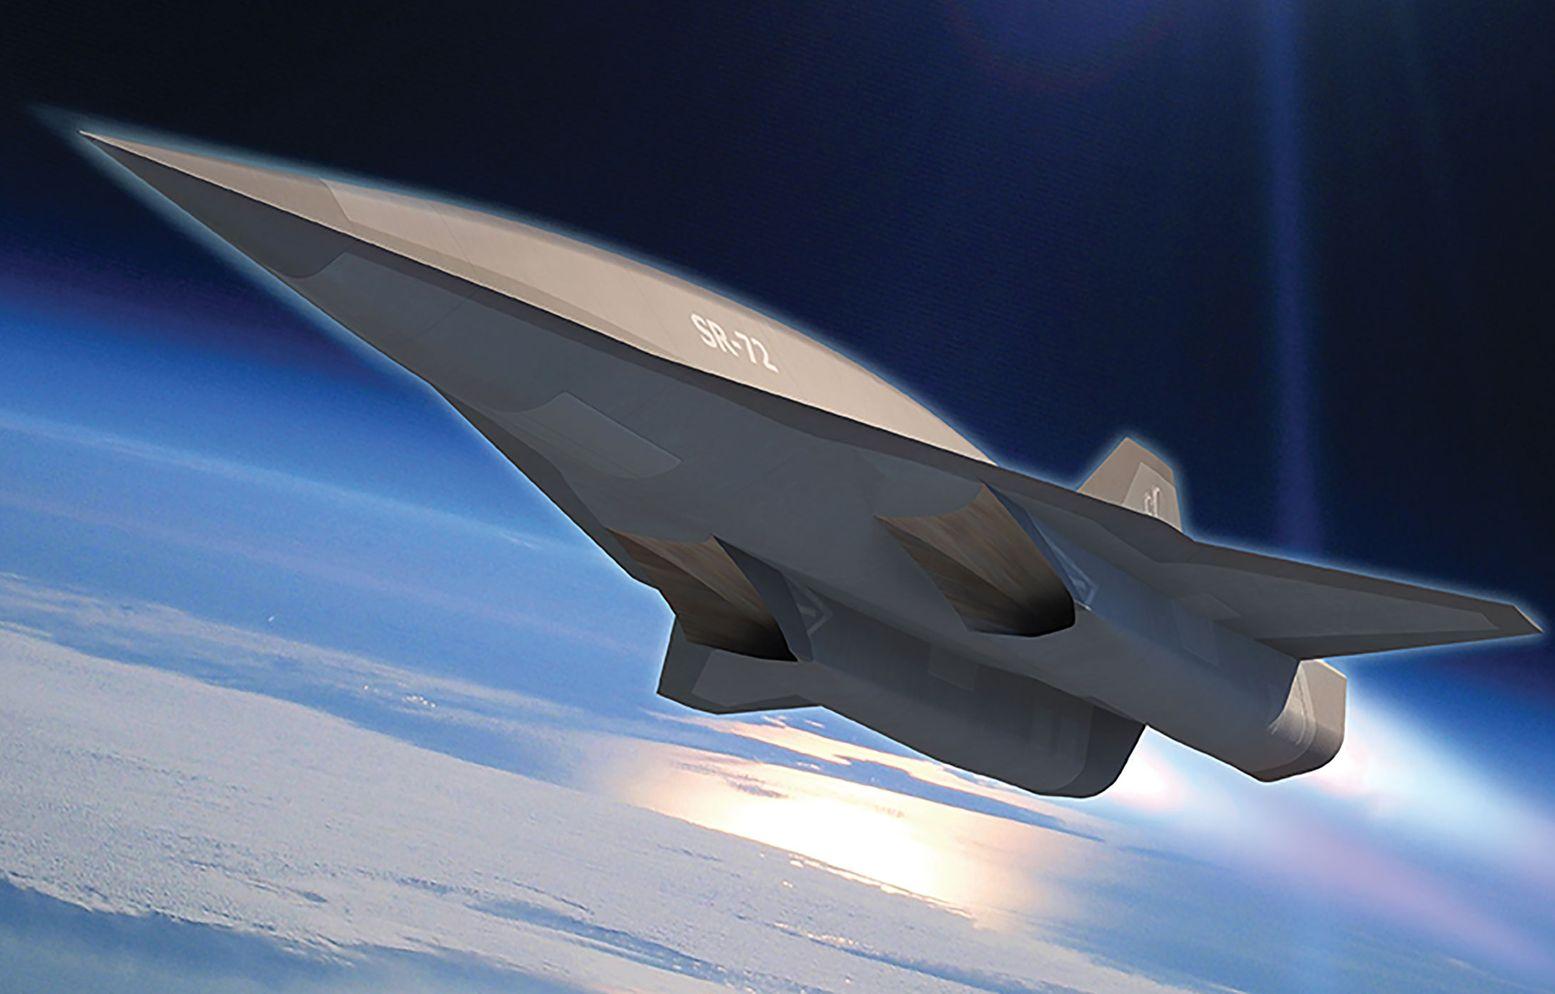 The Air Force's Secret SR-72 Spy Plane: Speeds 'Greater Than Mach 5'